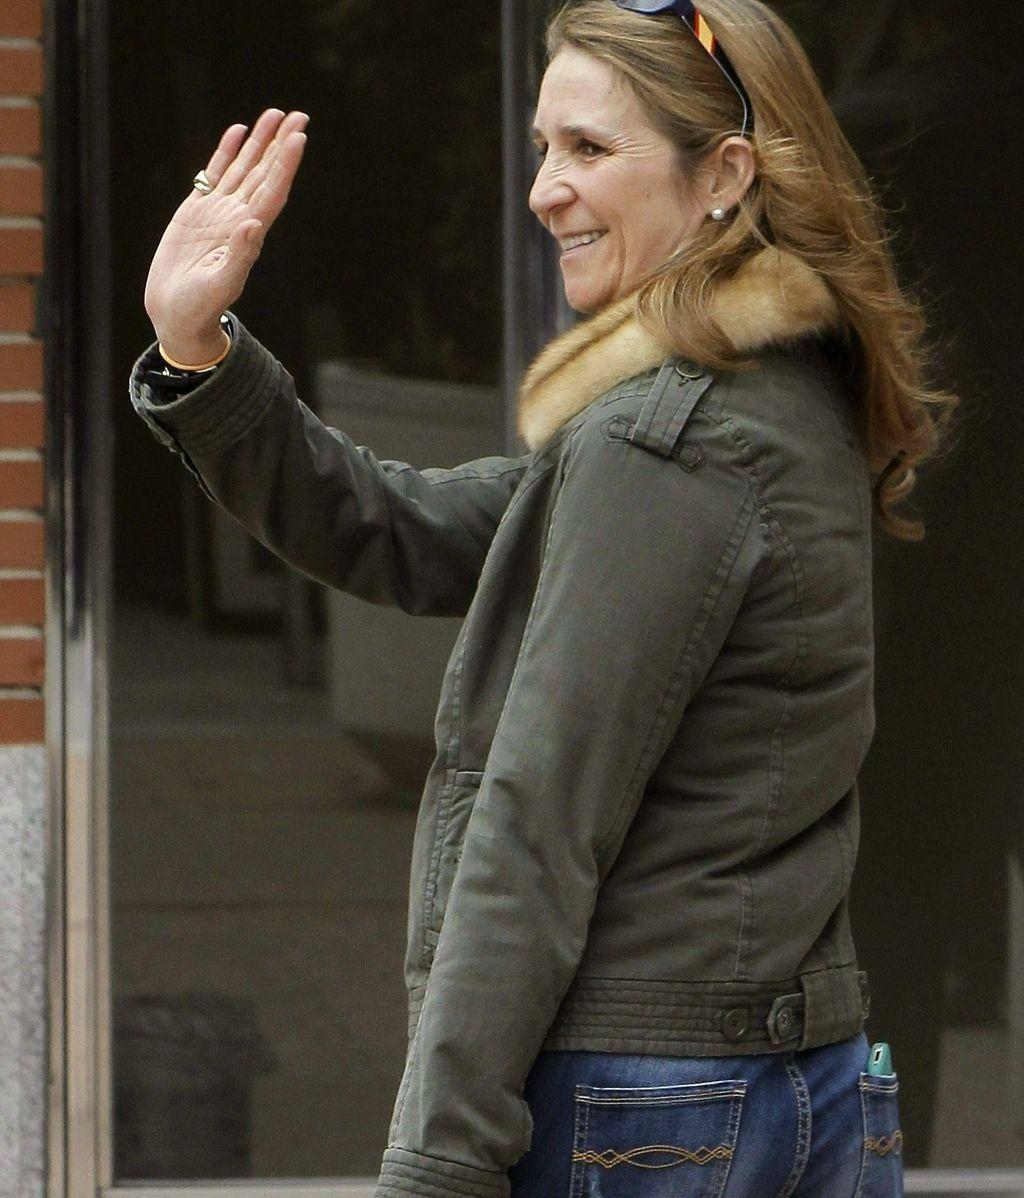 La Infanta Elena saliendo de la clínica La Milagrosa. Foto: EFE